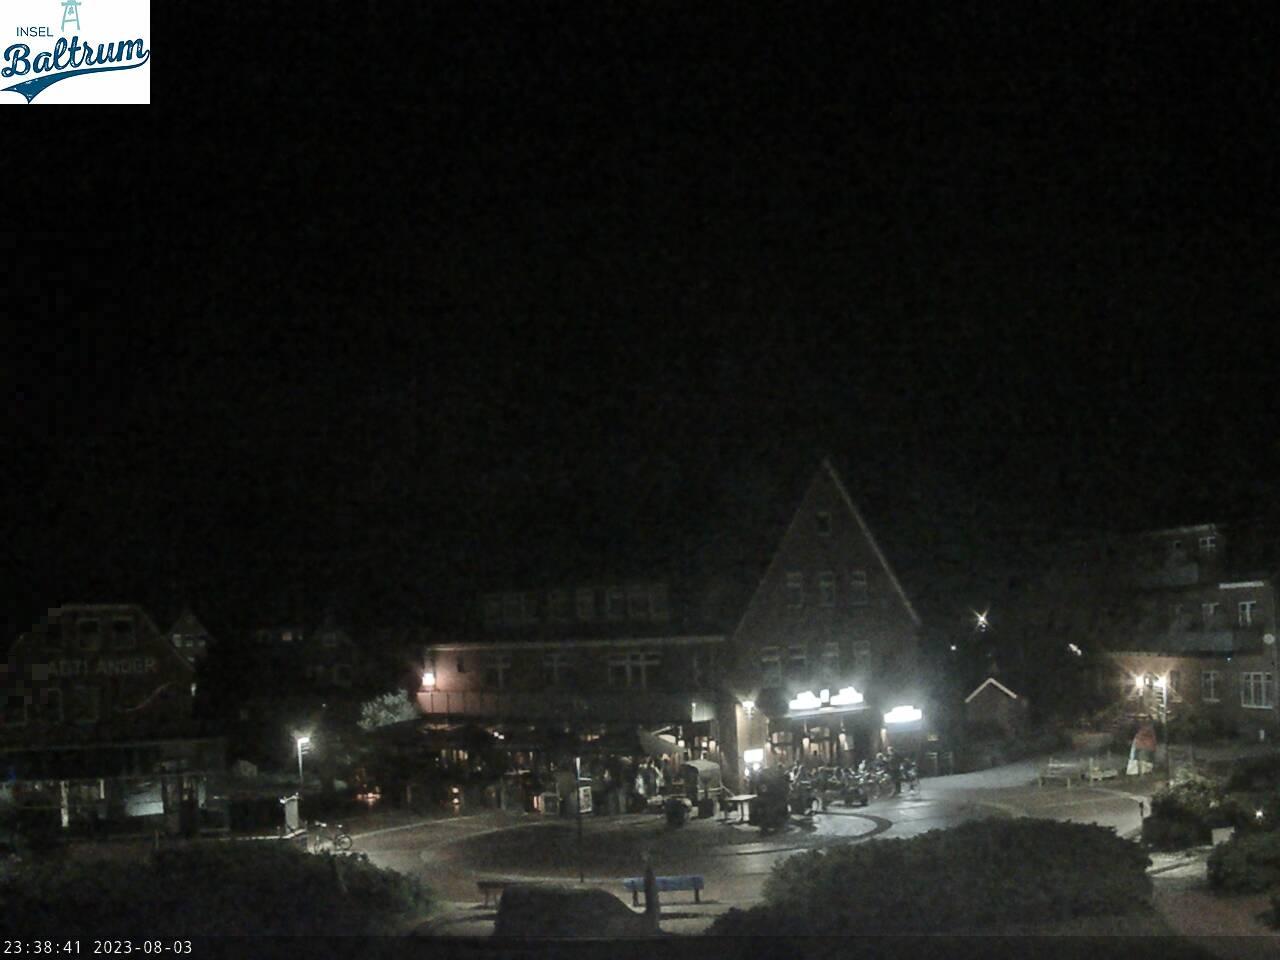 webcam am Rathaus Blick Richtig Westen